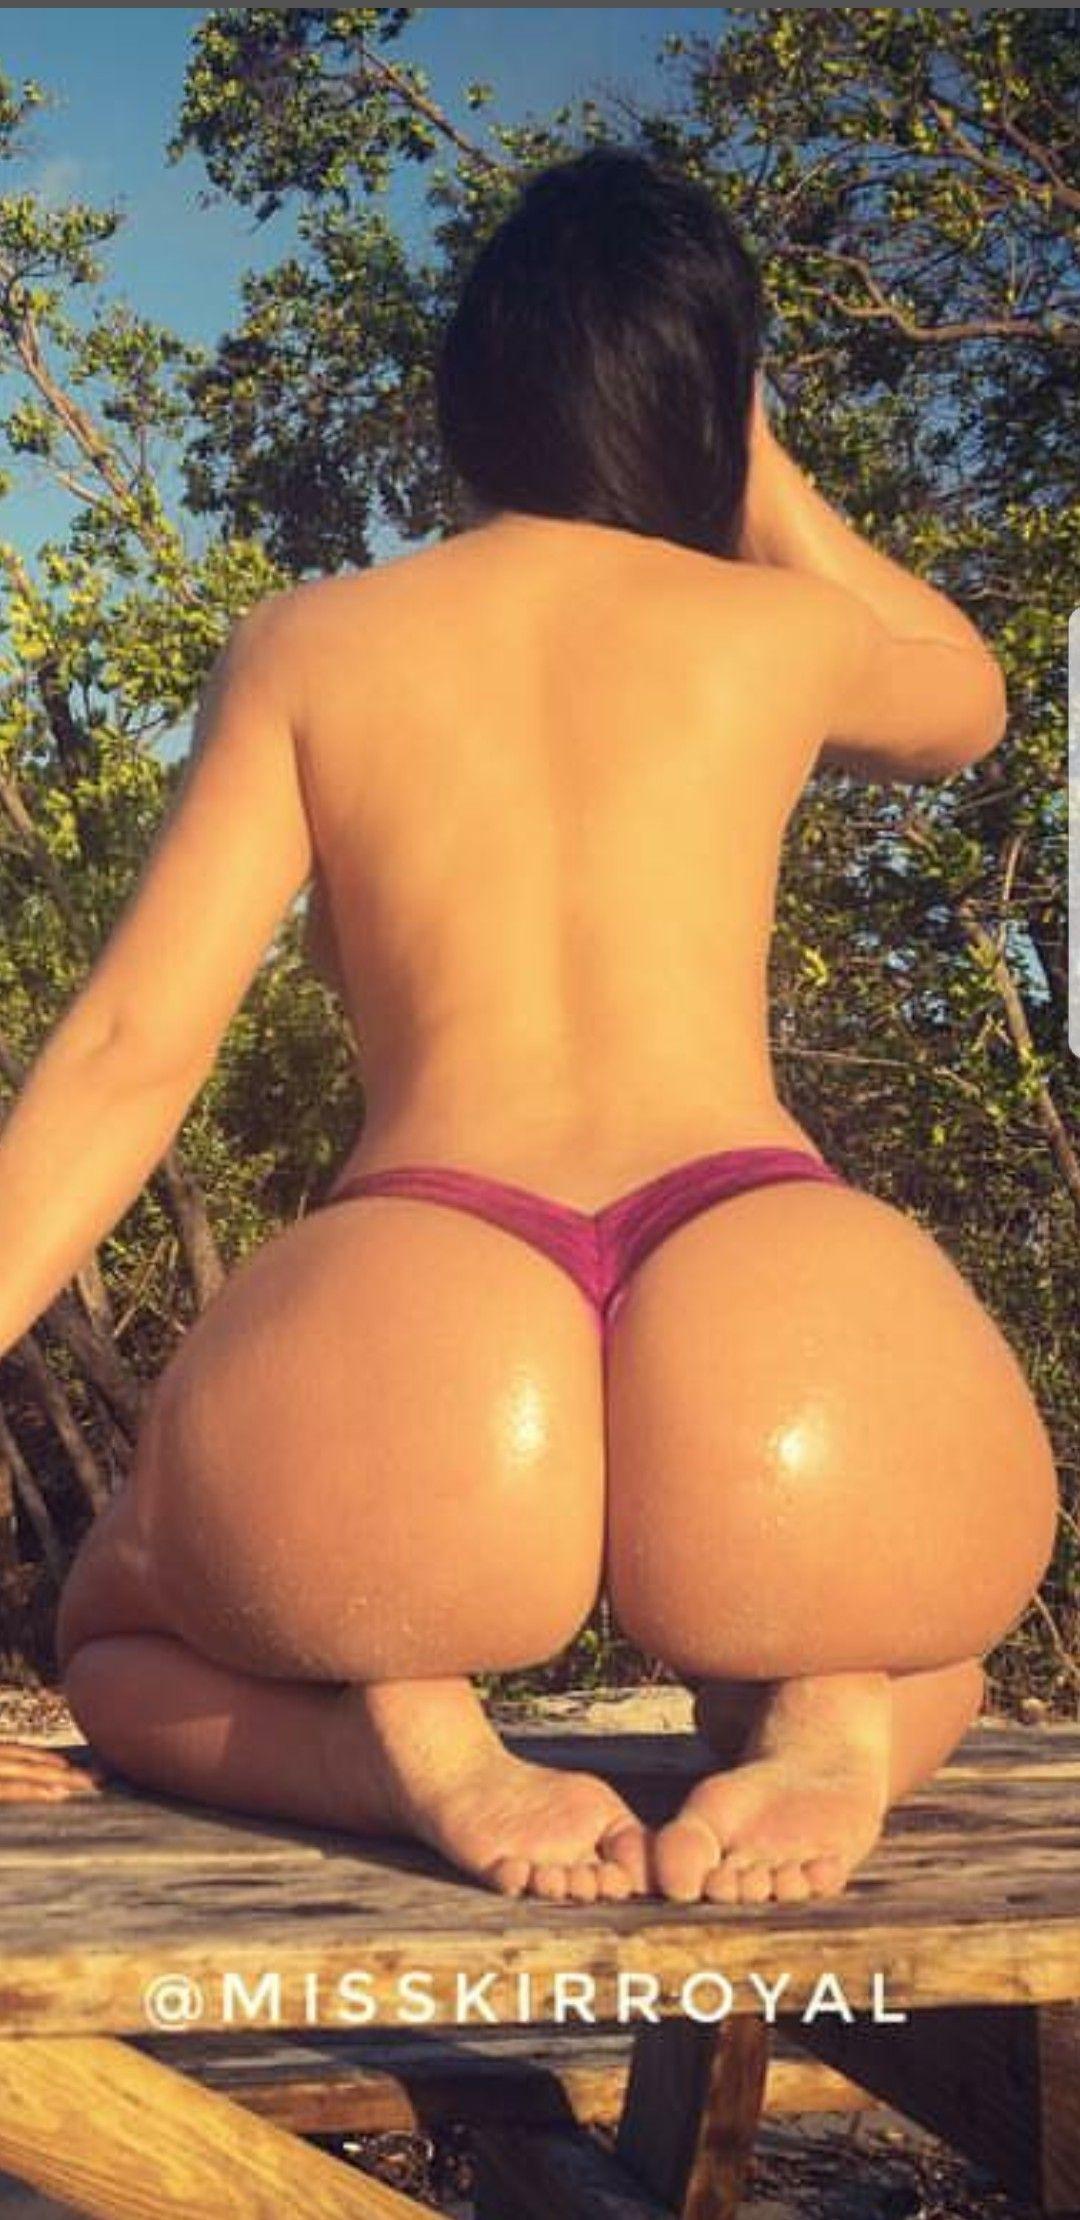 nice asses